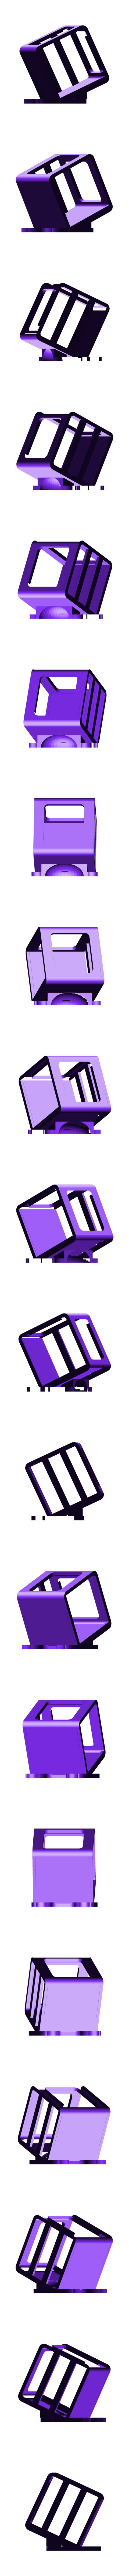 Mark_II_runcam5_25d_ready-to-prnt.stl Télécharger fichier STL gratuit Runcam 5 Case / Mark II 25° montage 25 • Objet imprimable en 3D, Gophy